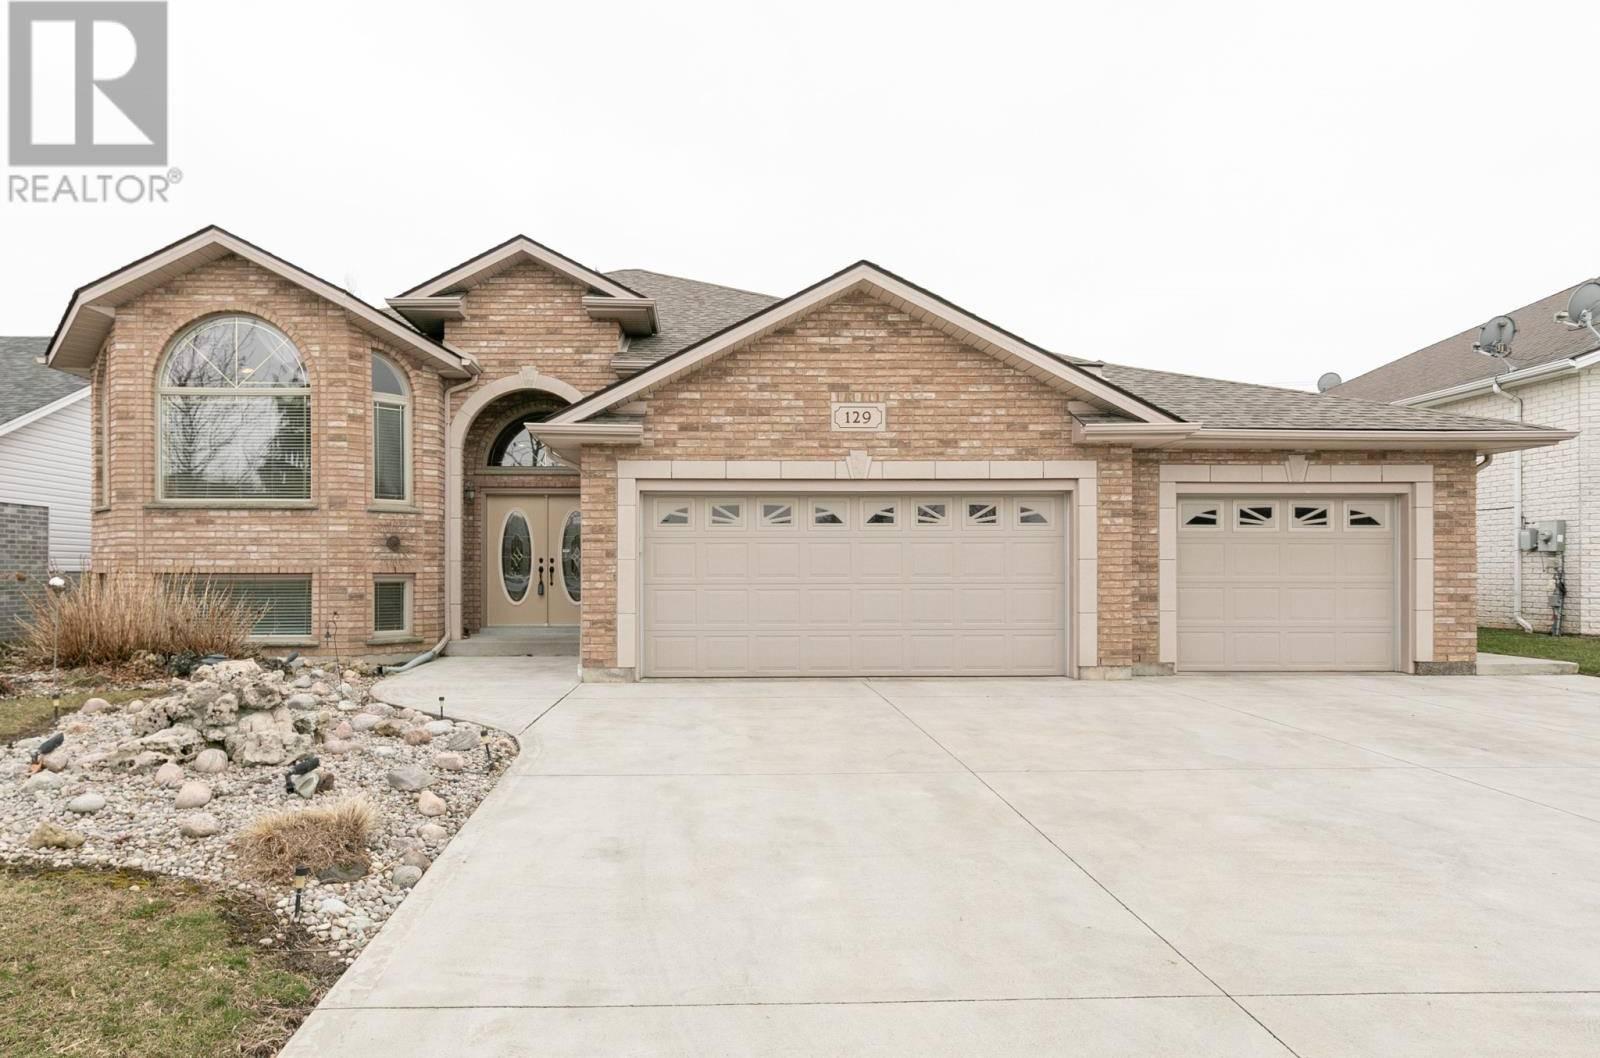 House for sale at 129 Park Lane Circ Amherstburg Ontario - MLS: 20003670